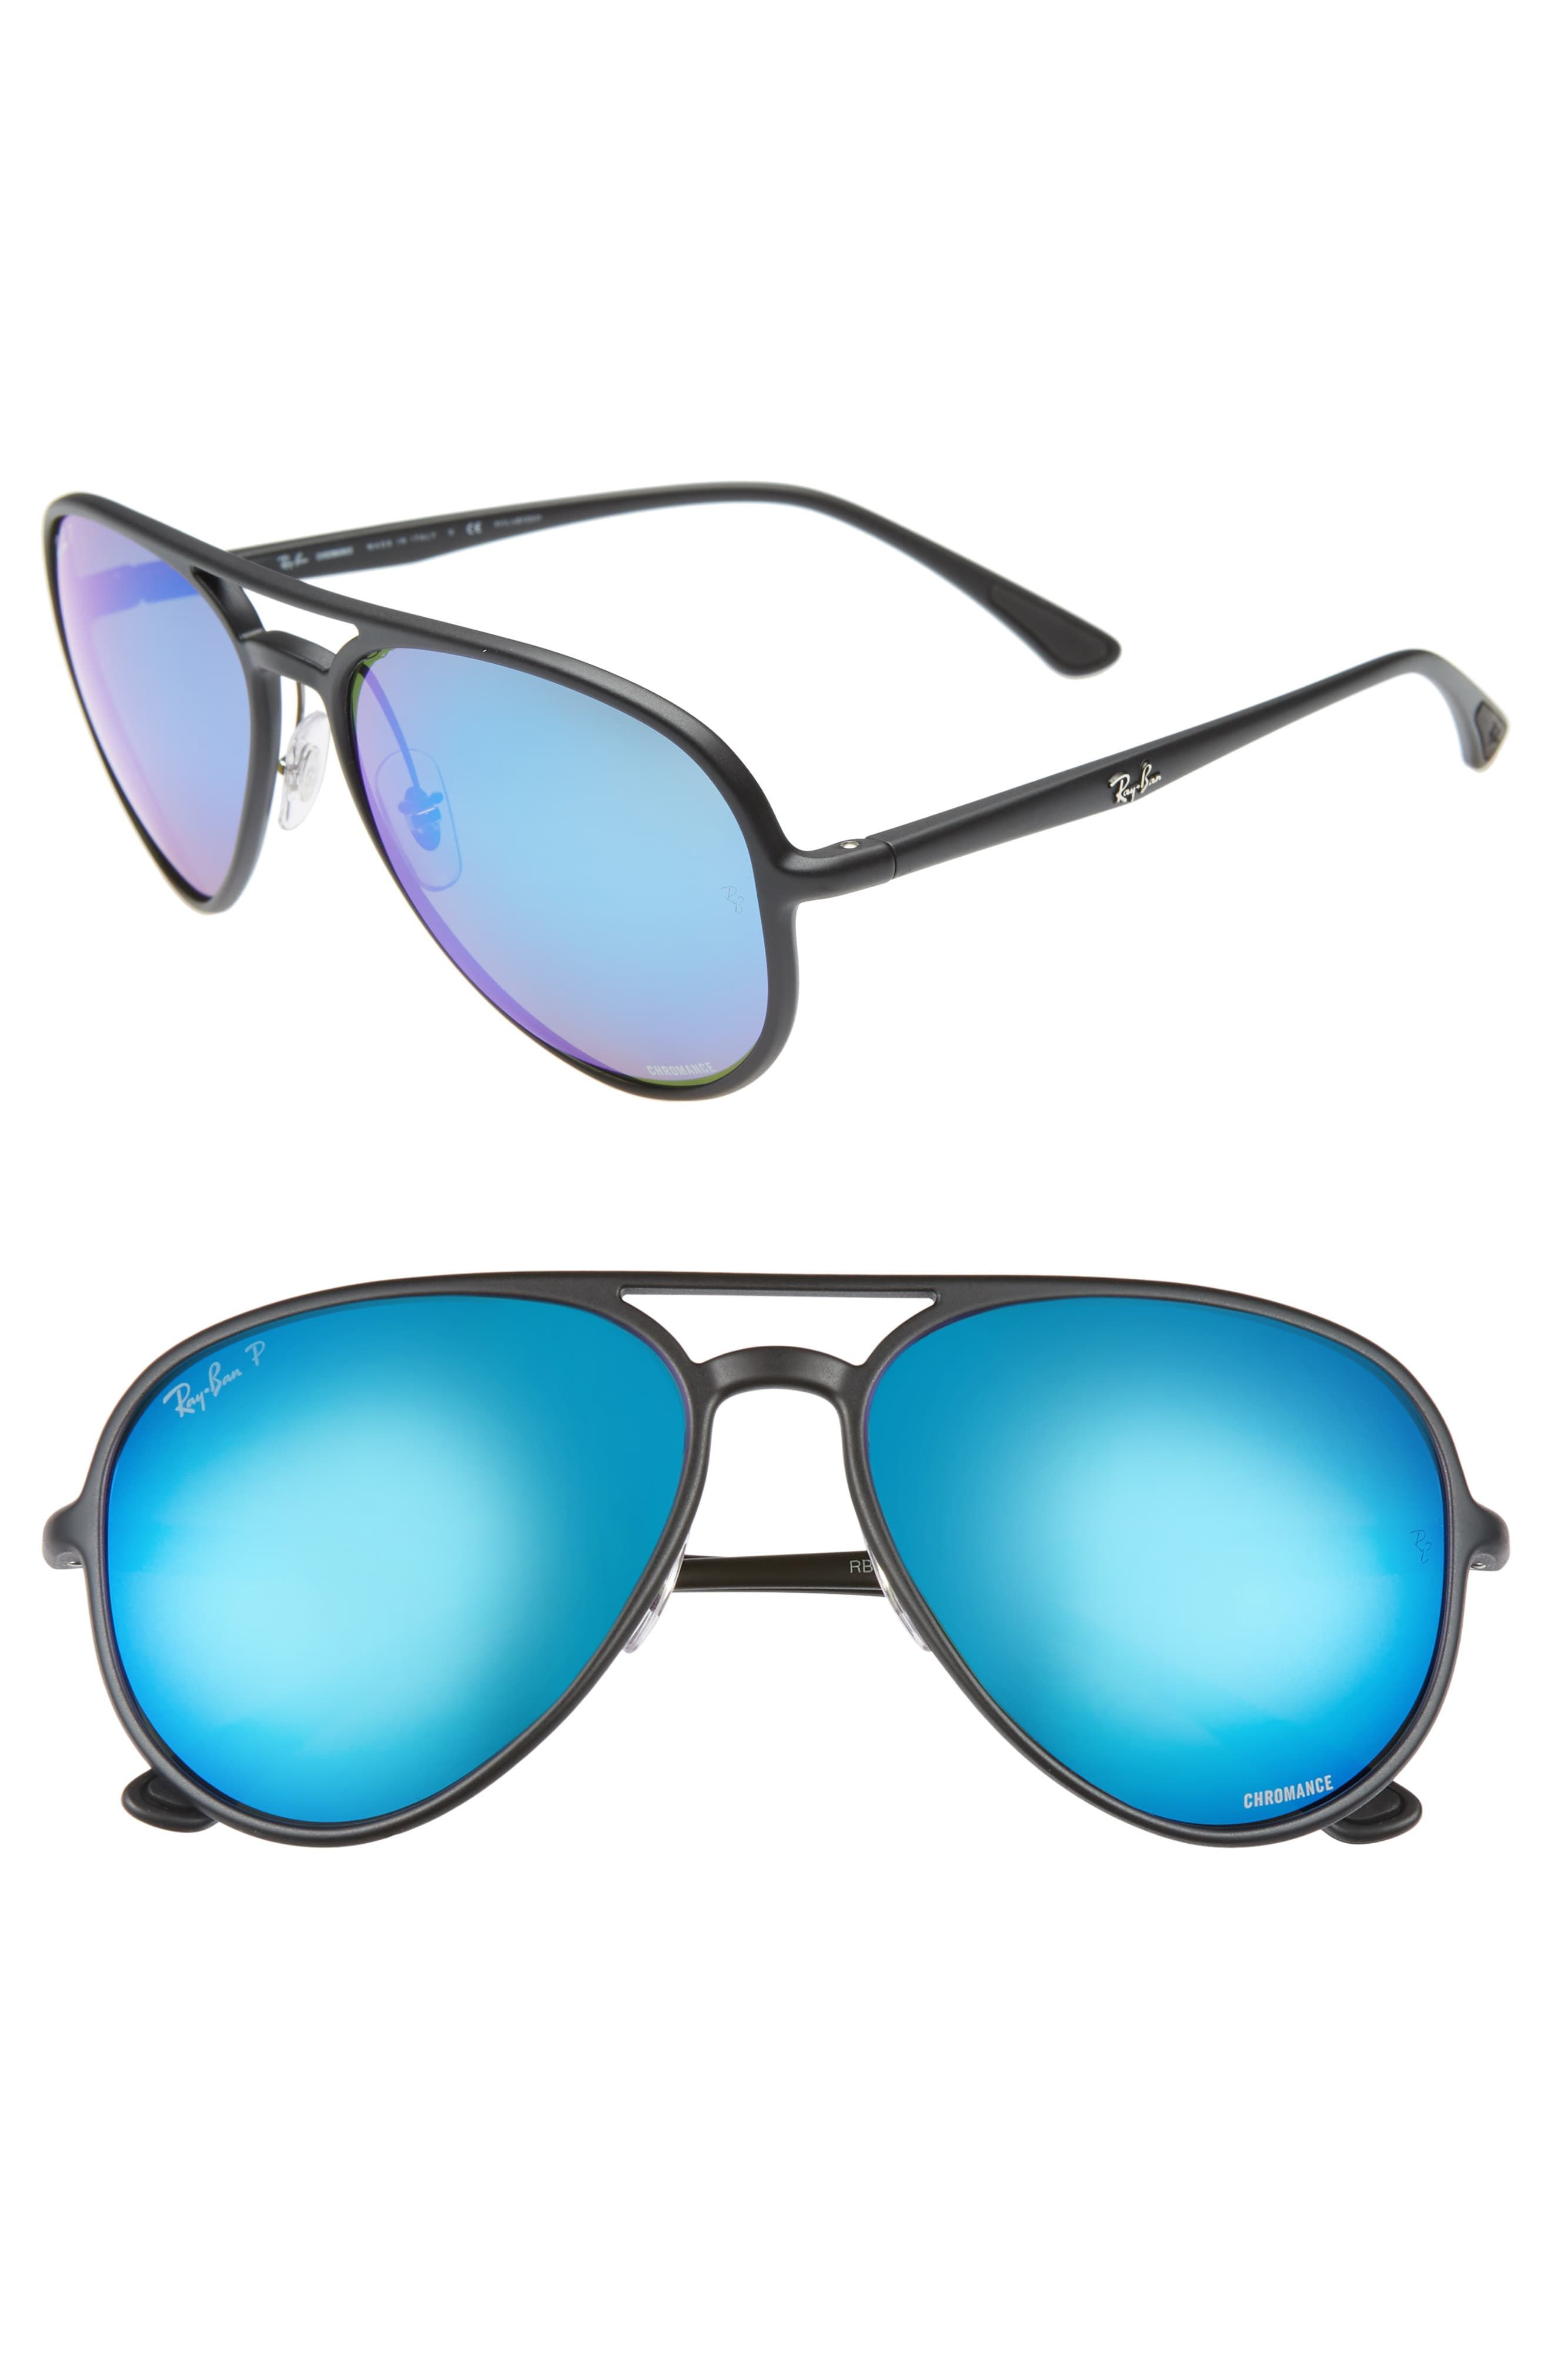 Men's Ray Ban 58Mm Navigator Sunglasses